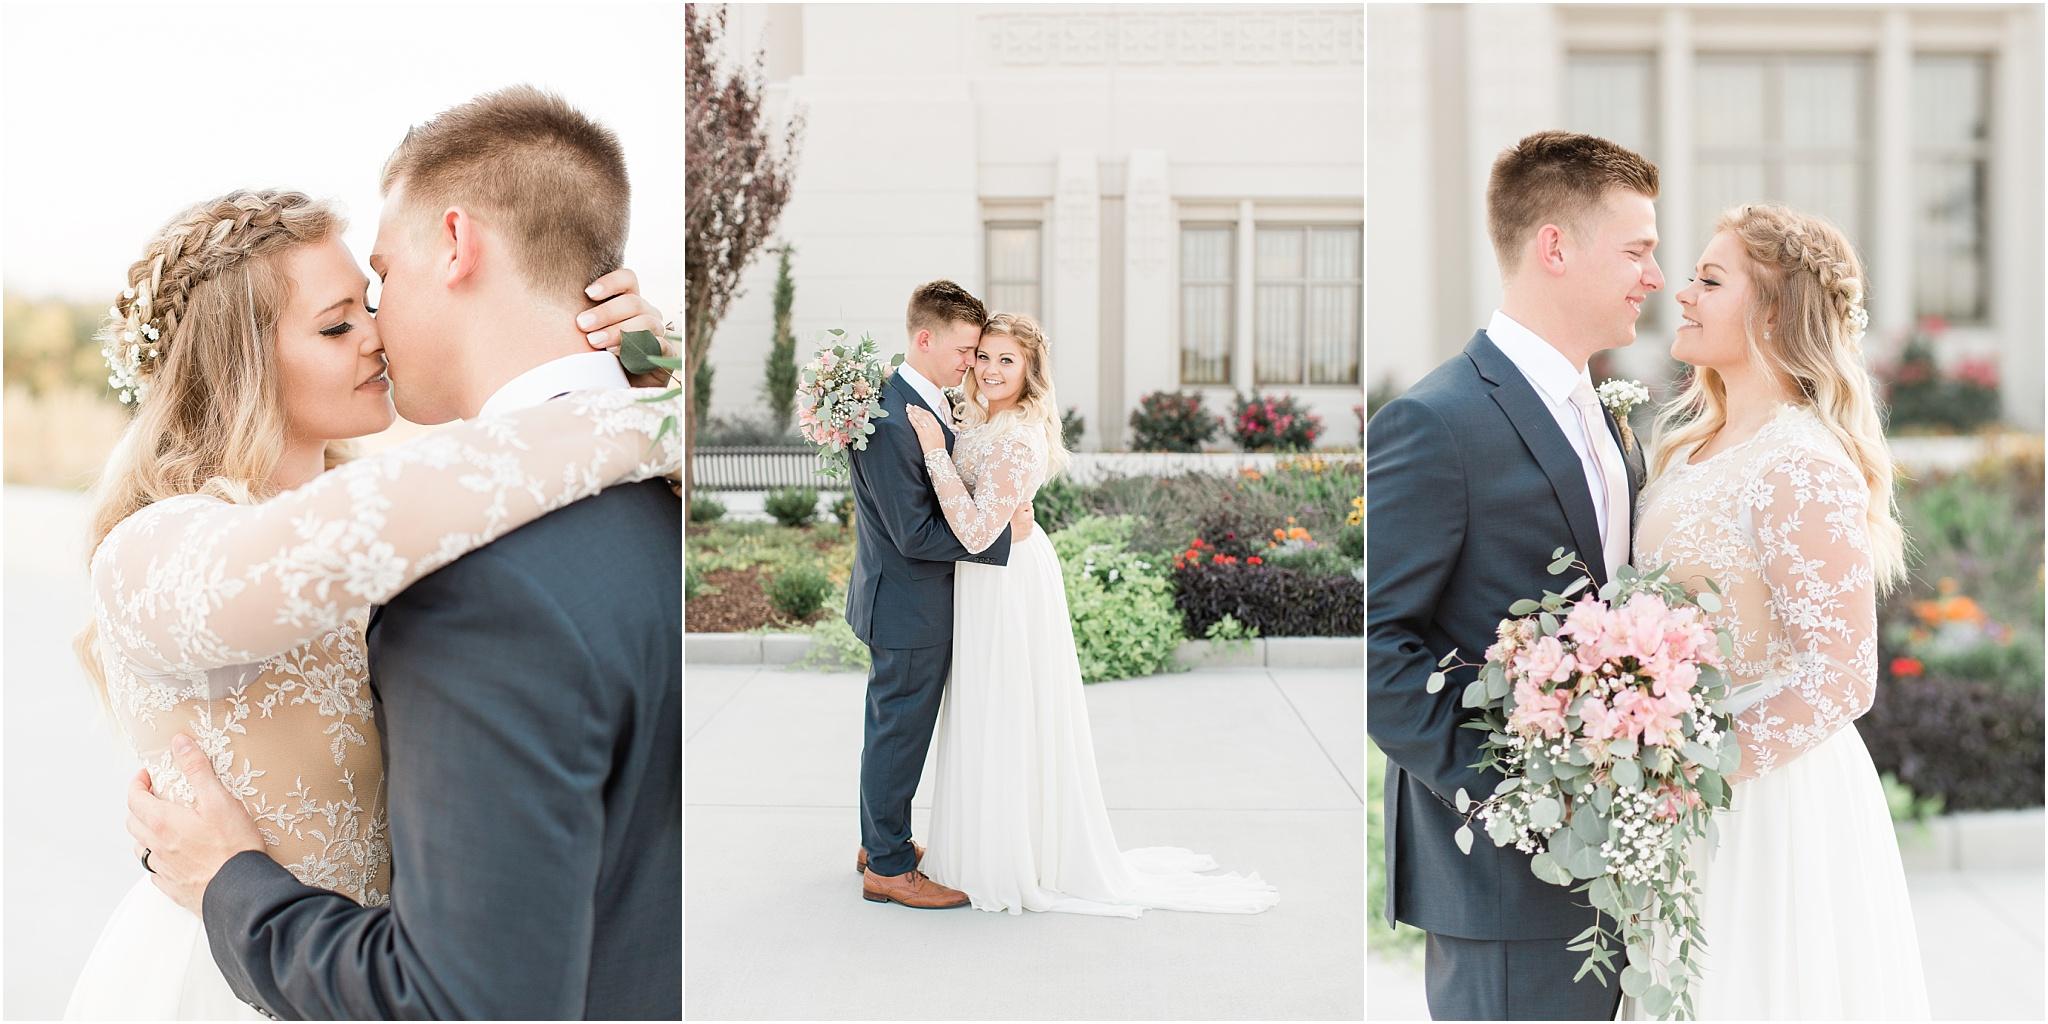 Wedding Photography_Meridian Idaho Temple_Boise Idaho_Nampa Idaho_Leah Southwick Photography_0016.jpg